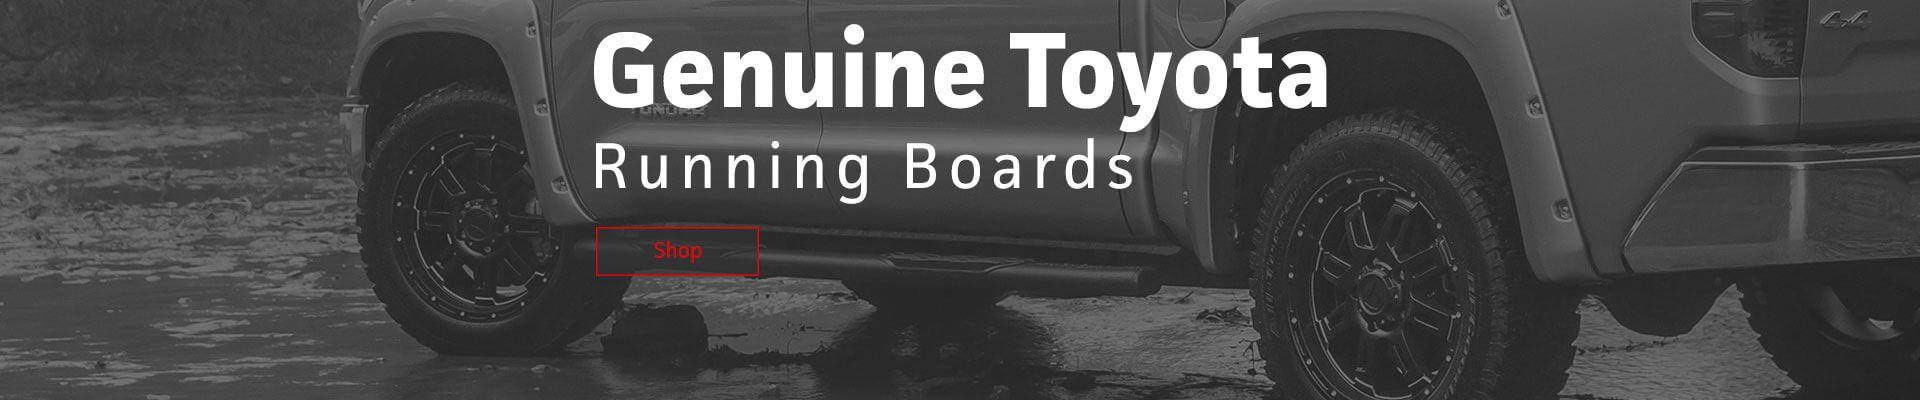 Toyota Running Boards